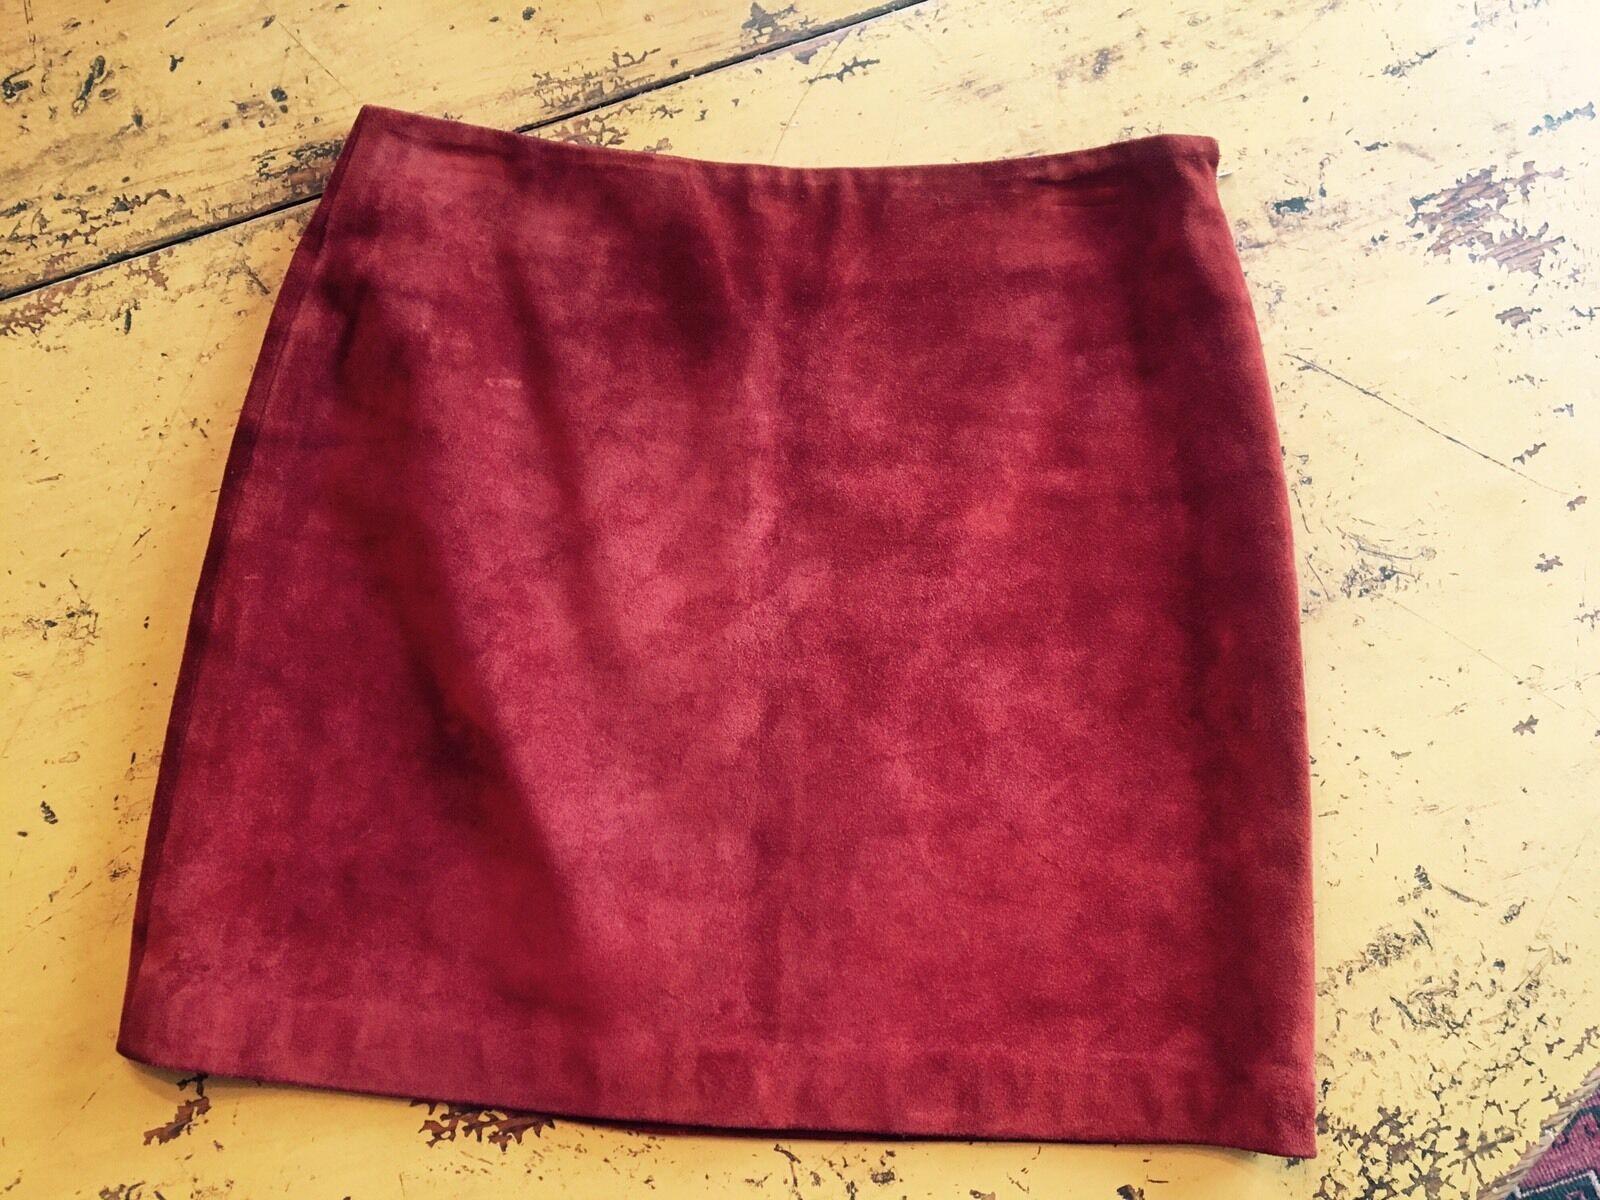 DKNY women Karan New York Women's Designer 100% Suede Mini Skirt Rust Red